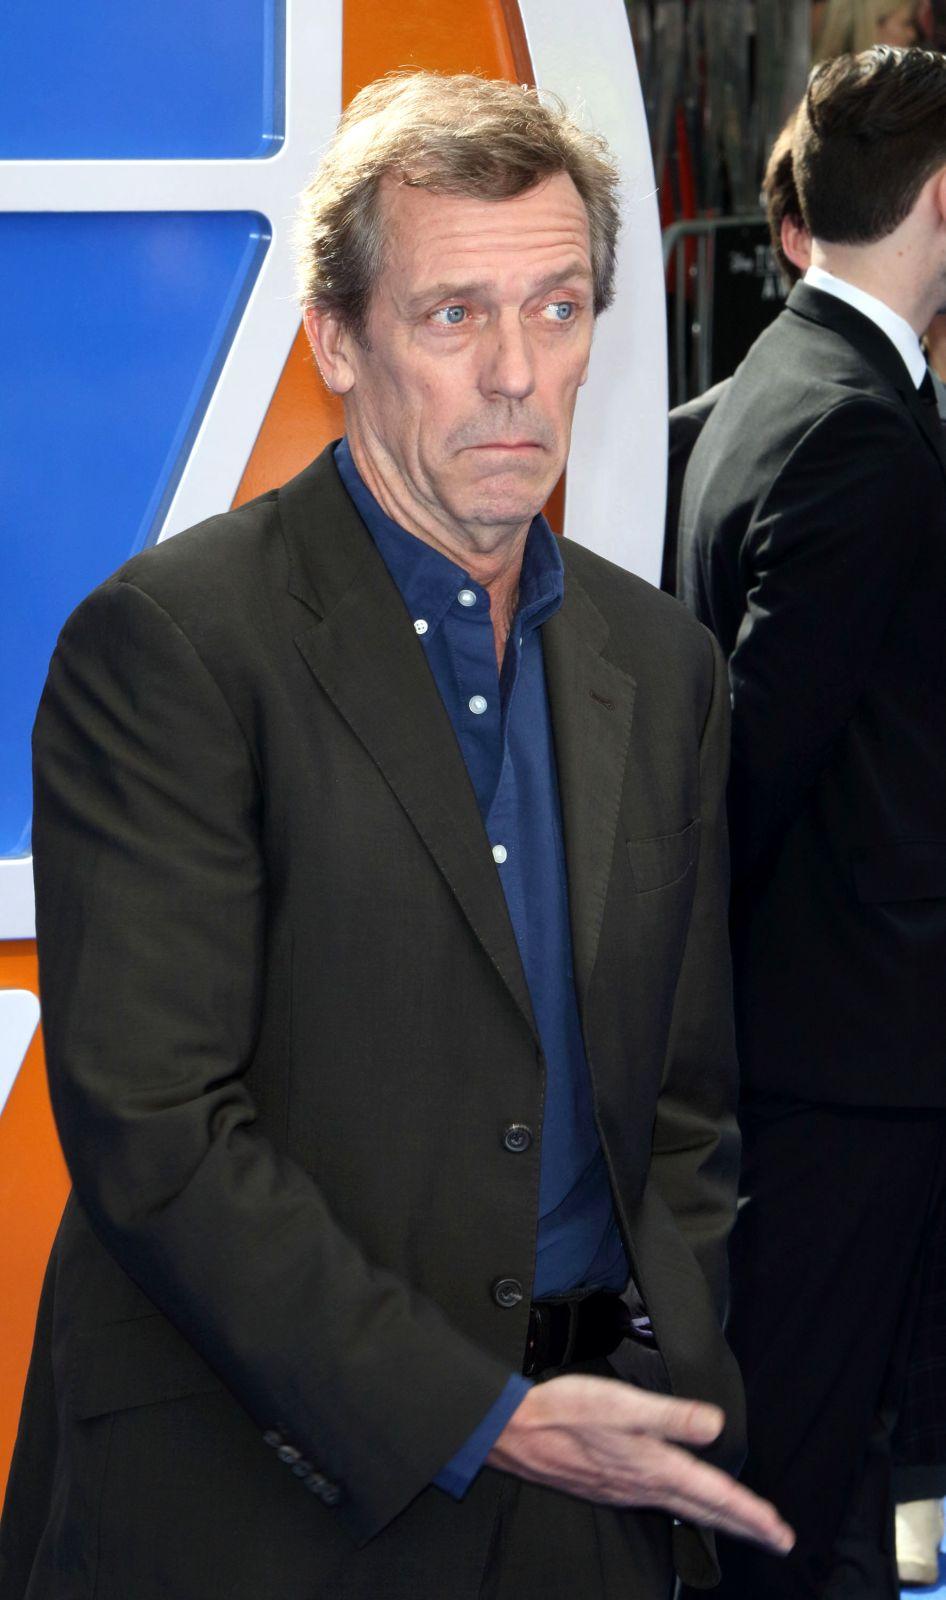 Hugh Laurie40 - Tomorrowland Premiere London 2015.jpg